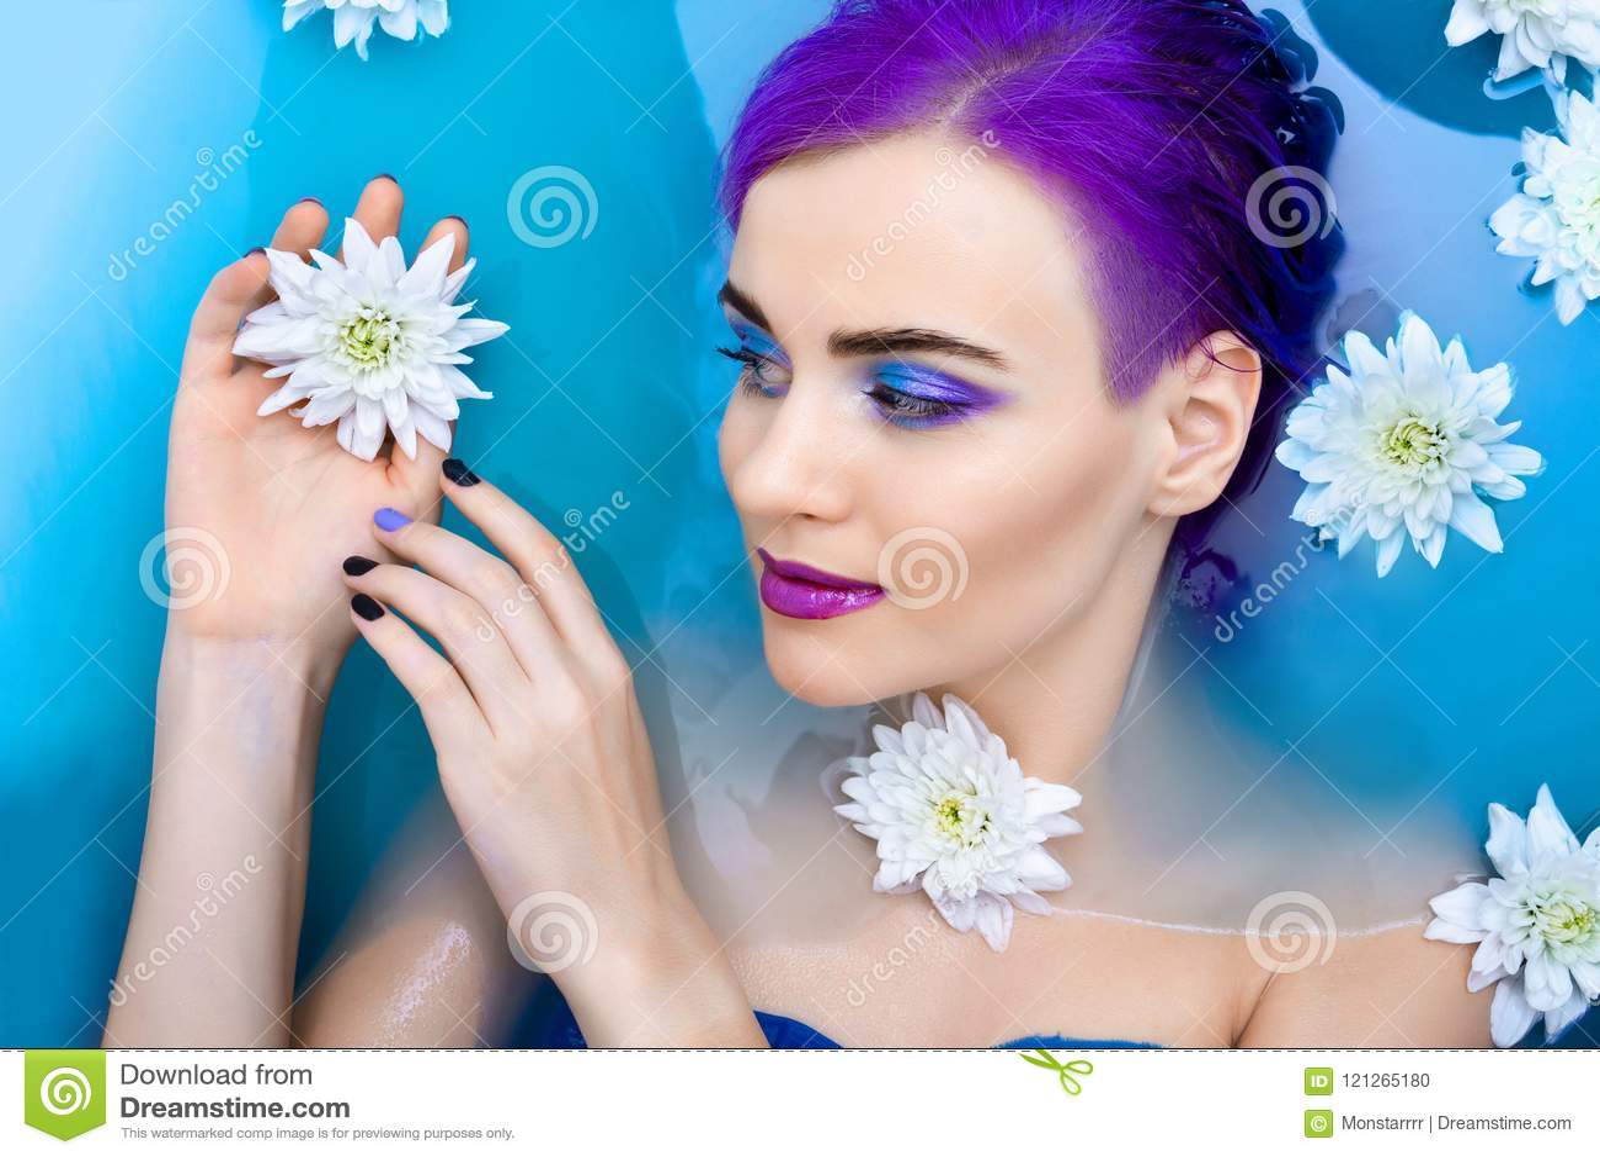 Portrait Of Young Cute Female Fashion Luxury Model In Bathtub With ...